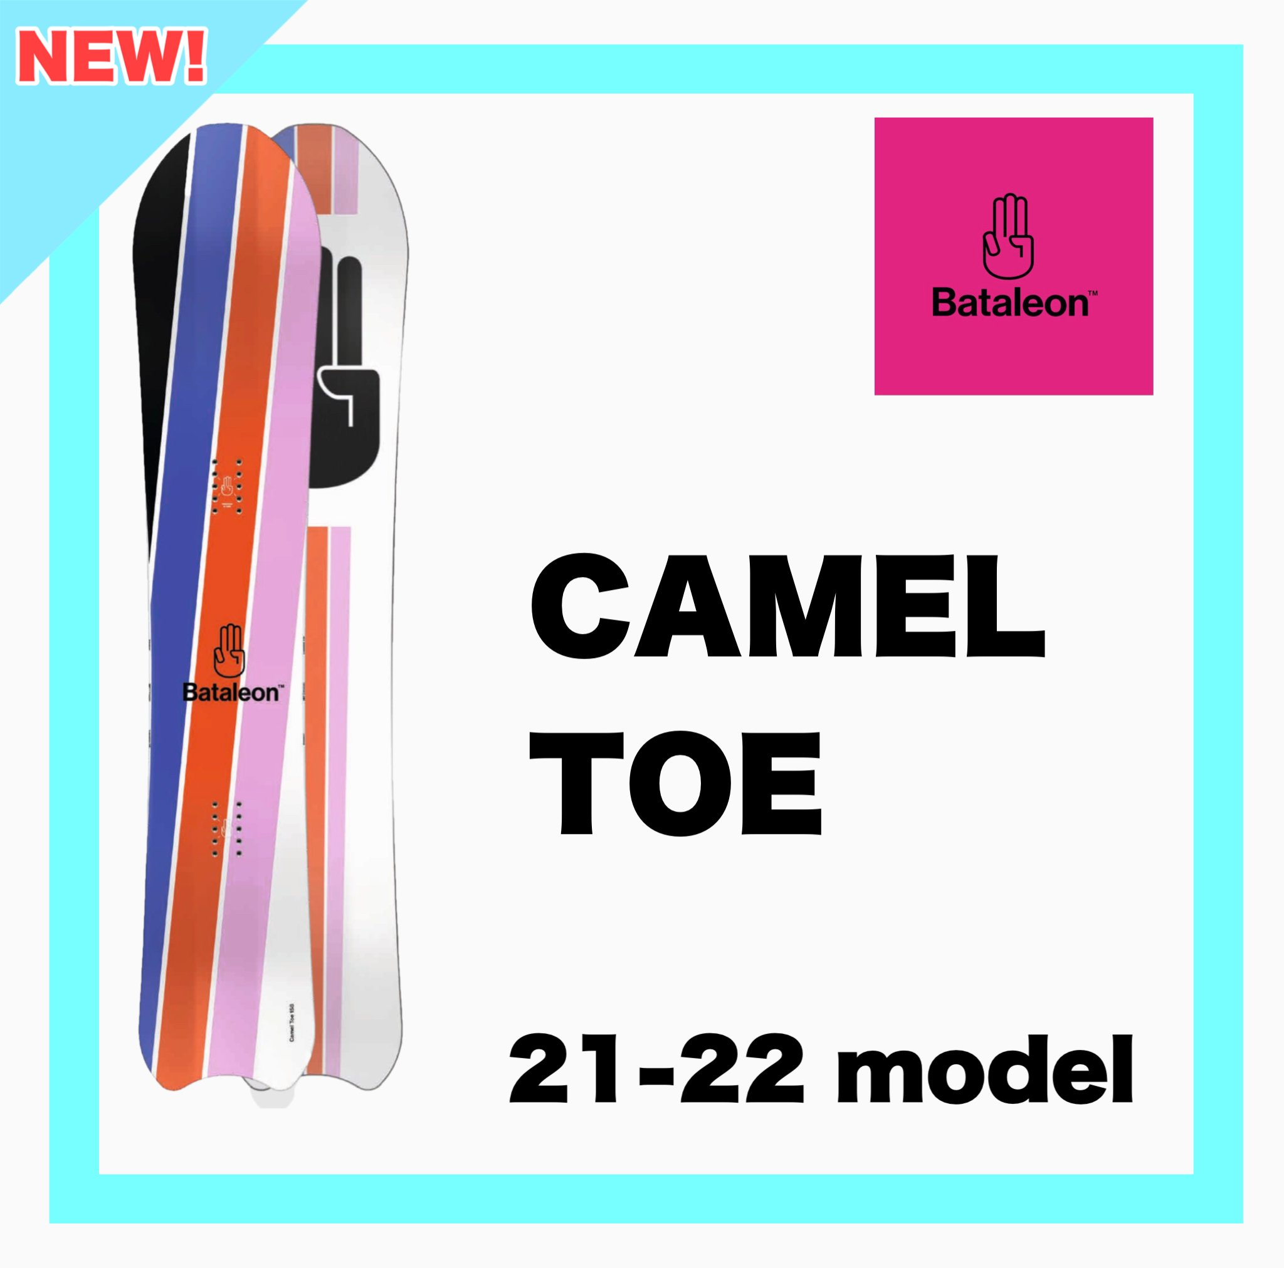 <img class='new_mark_img1' src='https://img.shop-pro.jp/img/new/icons14.gif' style='border:none;display:inline;margin:0px;padding:0px;width:auto;' />BATALEON【Camel toe】